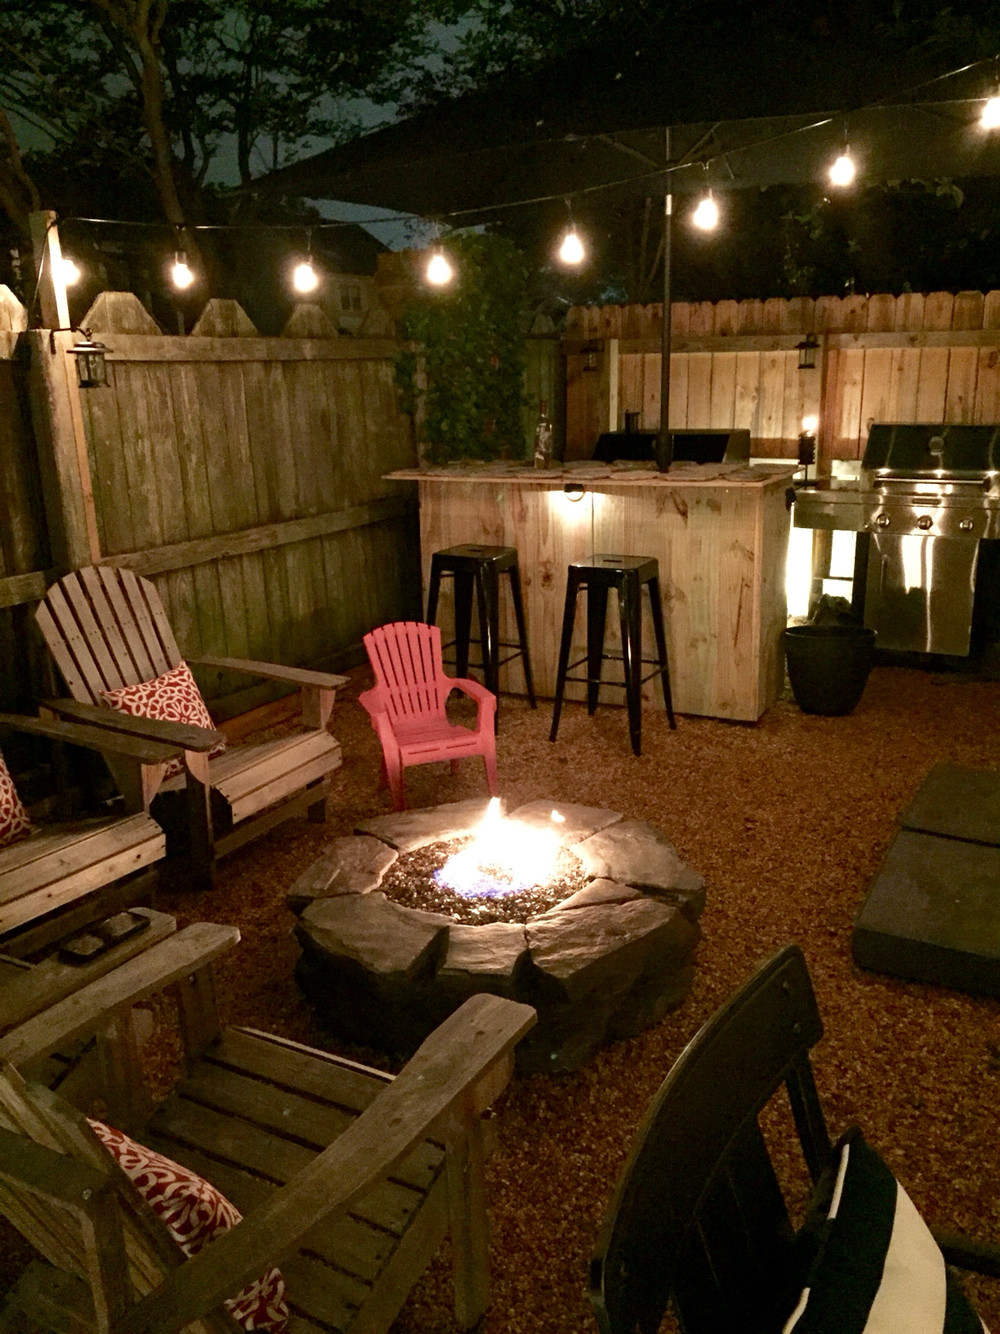 Backyard Fire Pit Party Ideas  18 Fire Pit Ideas For Your Backyard Best of DIY Ideas